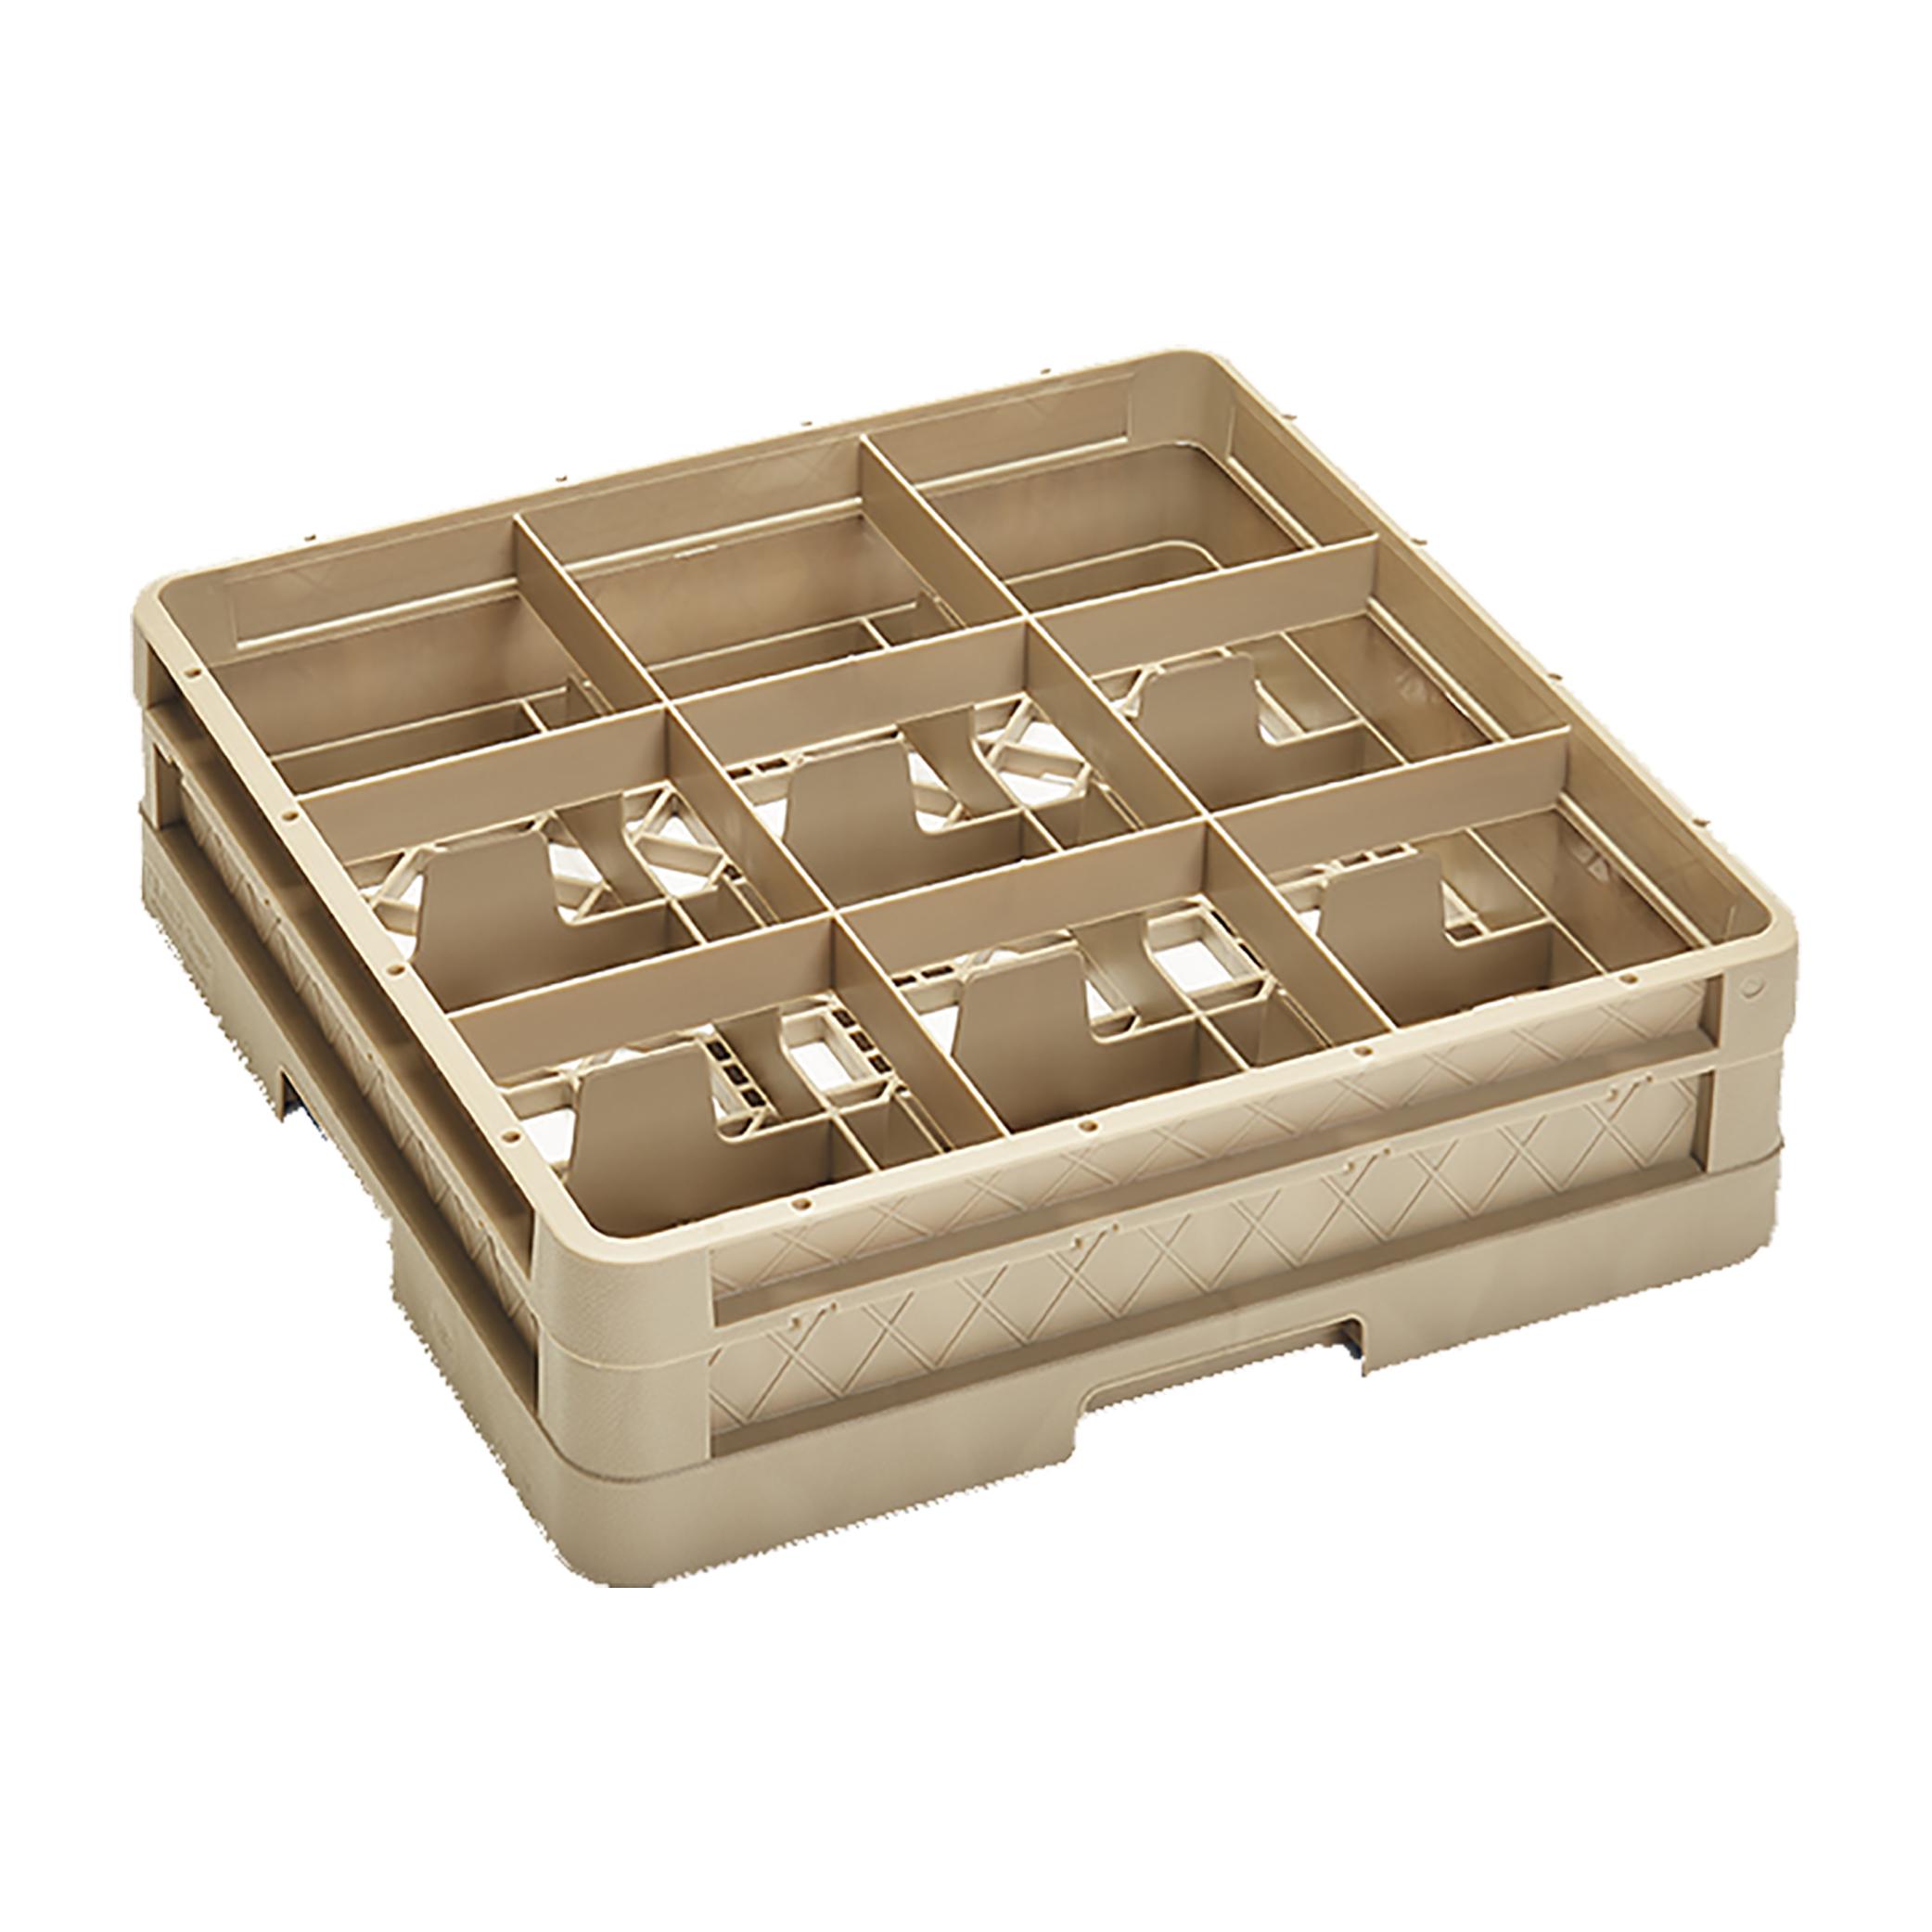 Vollrath CR10F dishwasher rack, glass compartment